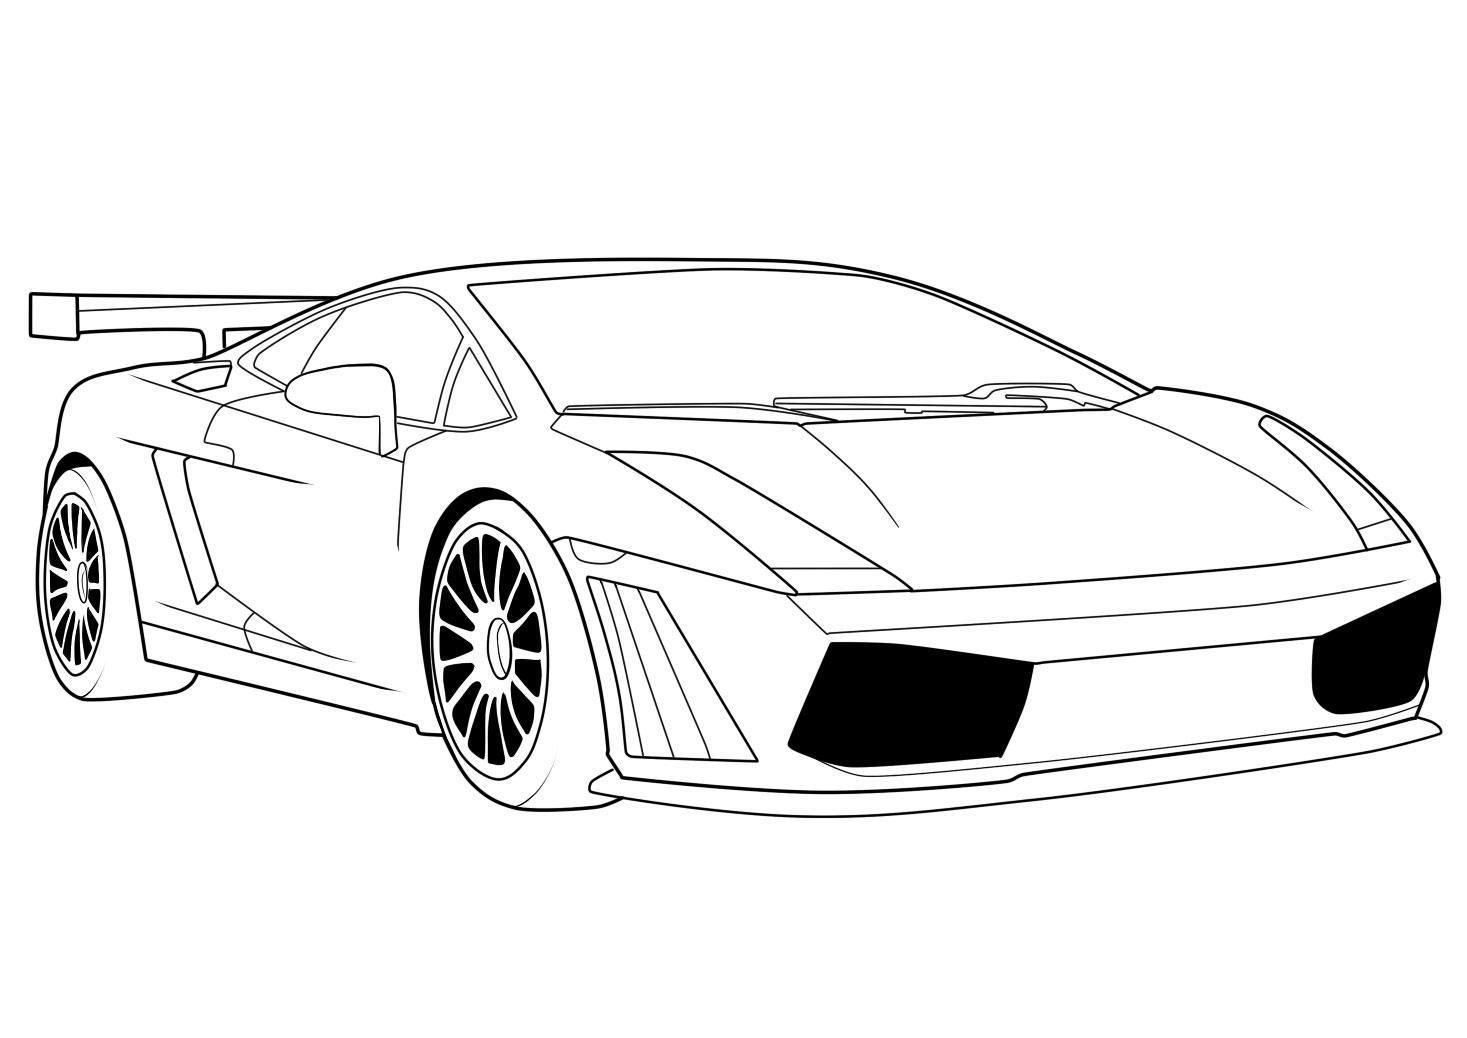 51 Coloring Page Lamborghini Race Car Coloring Pages Best Lamborghini Cars Coloring Pages